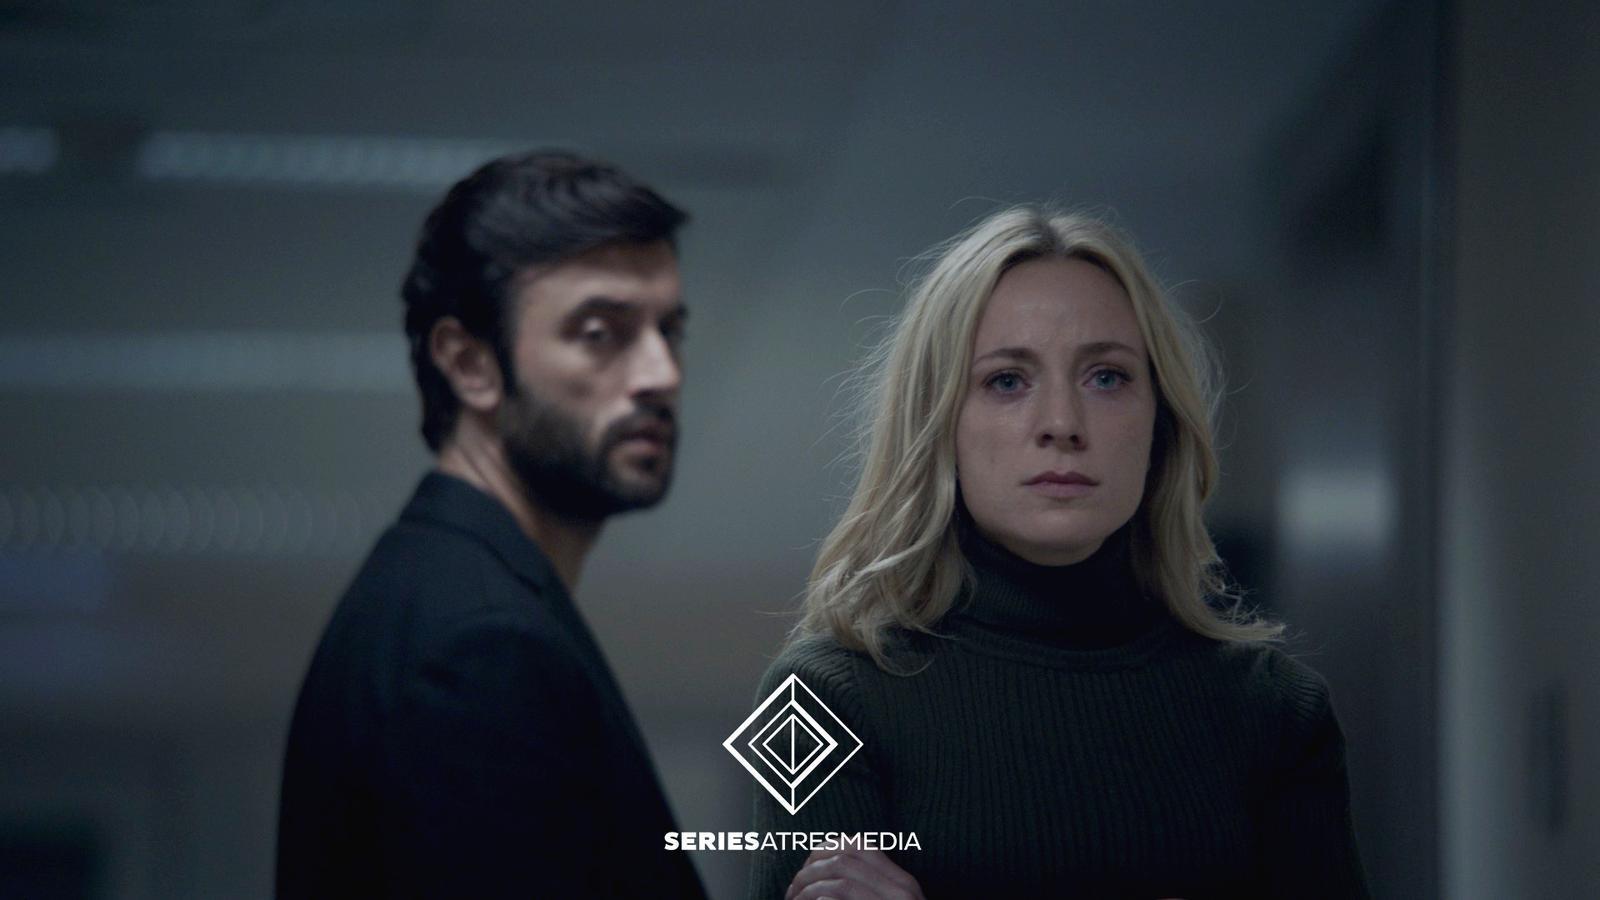 Antena 3 prepara la sèrie 'Mentiras', amb Javier Rey i Ángela Cremonte